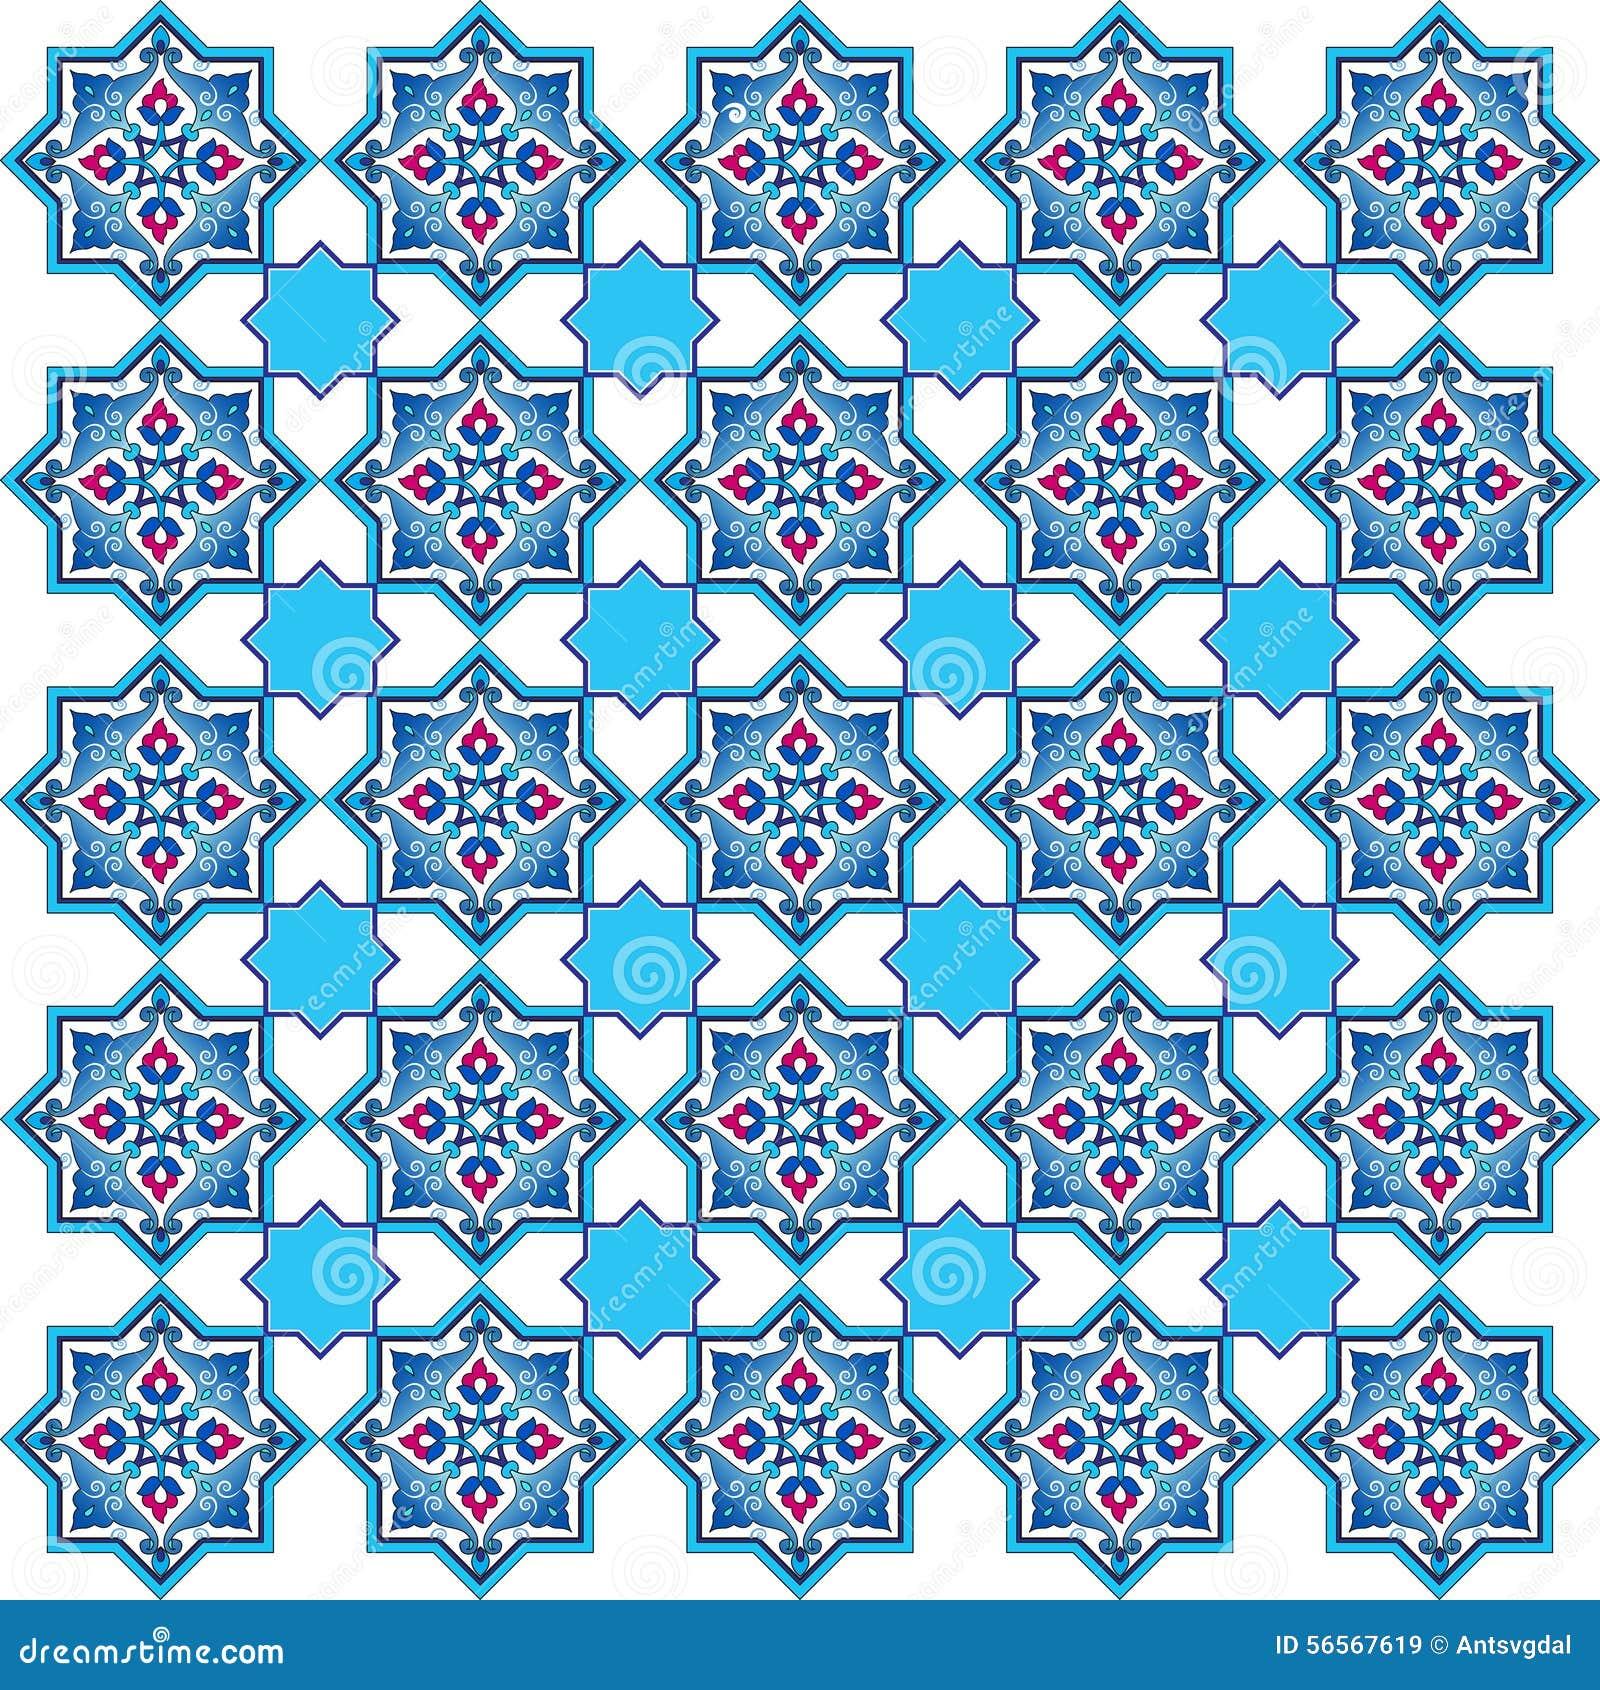 Download Σχεδιασμένος με τις σκιές της μπλε οθωμανικής σειράς πέντε σχεδίων Διανυσματική απεικόνιση - εικονογραφία από παλαιός, απεικόνιση: 56567619